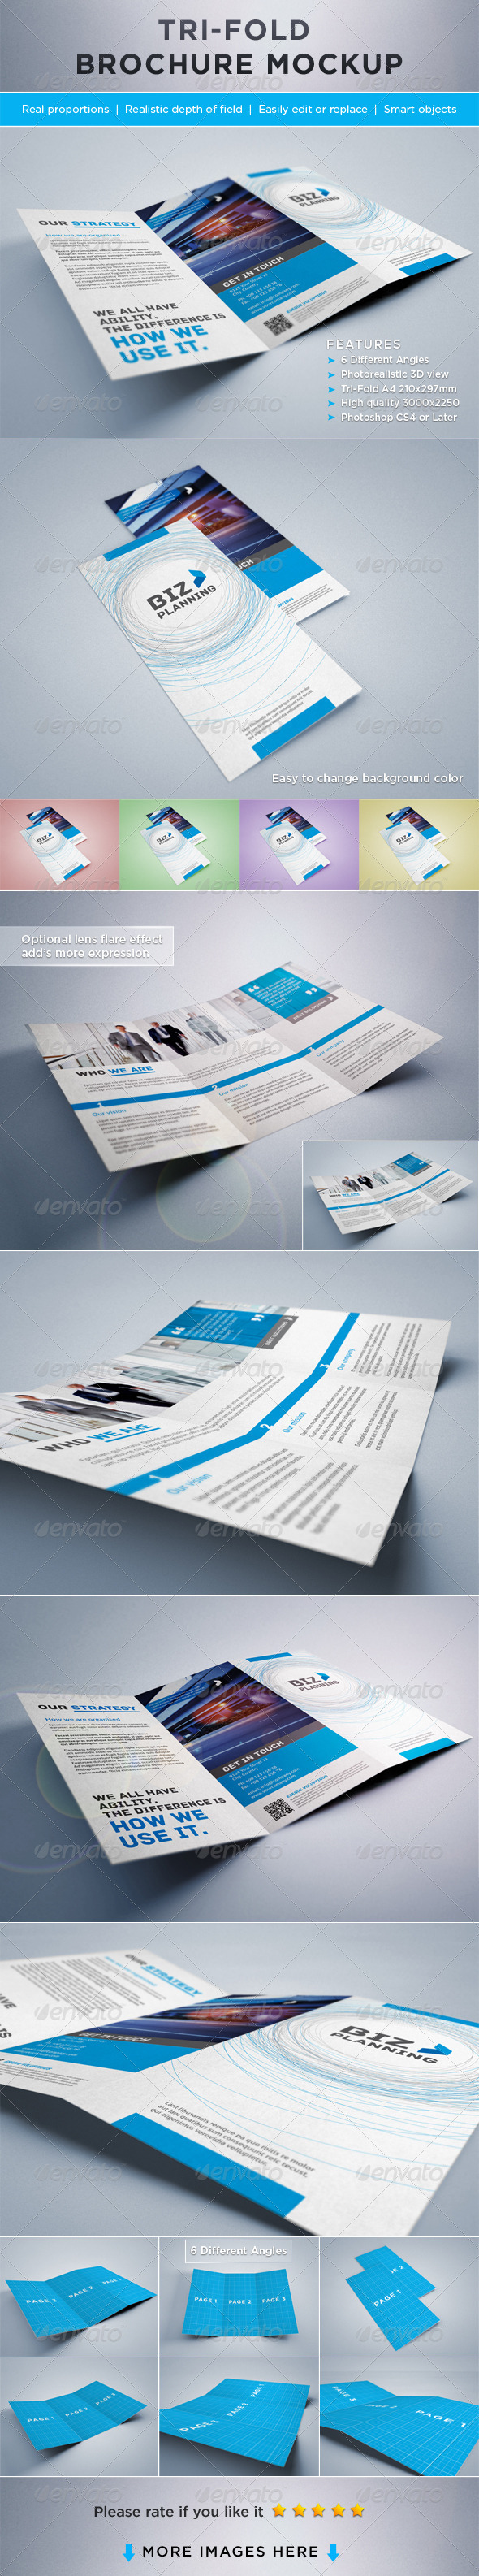 GraphicRiver Photorealistic Tri-Fold Brochure Mock-ups 2206979